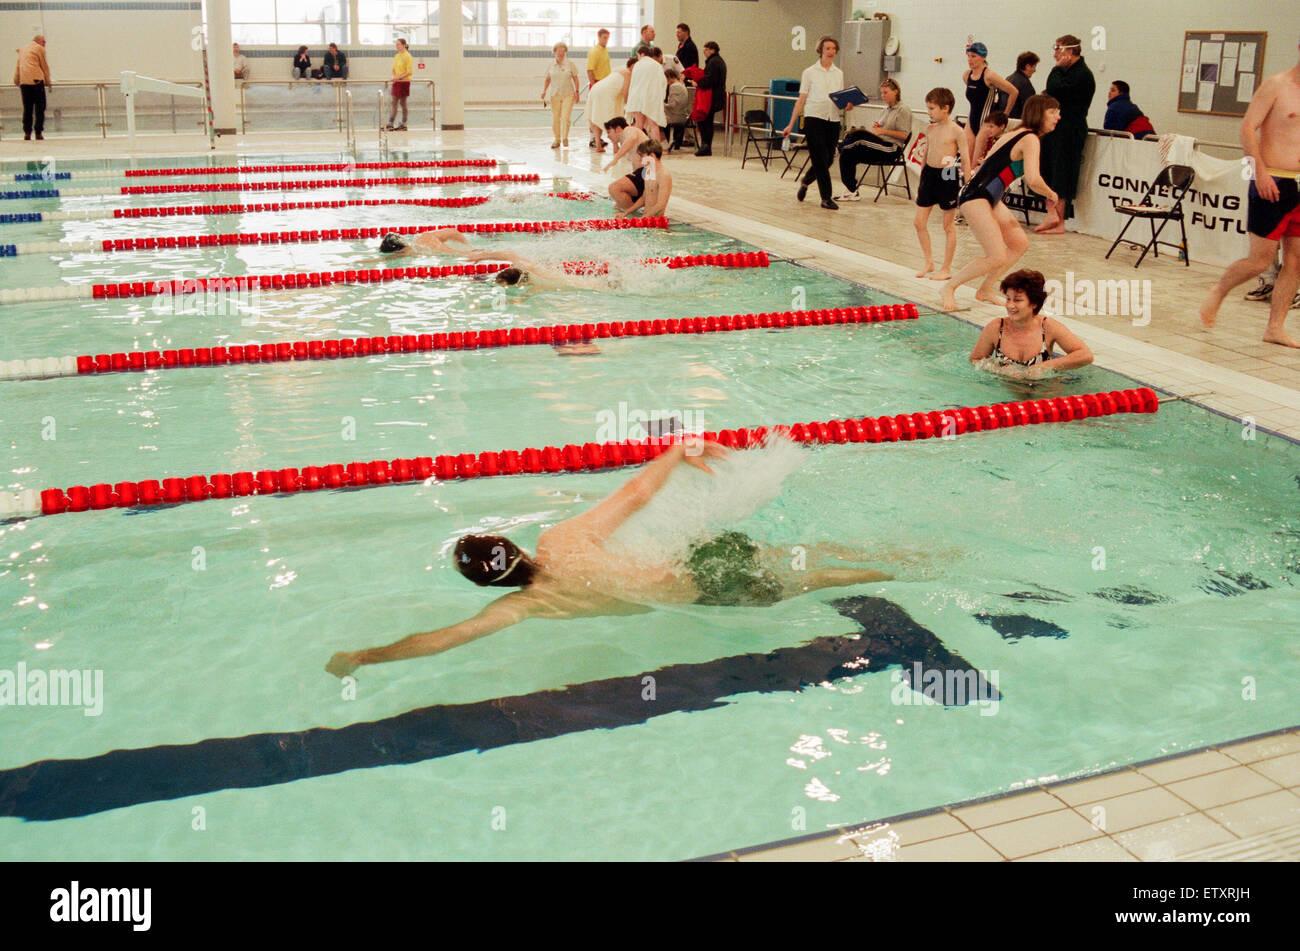 Swimming Pool Leisure Centre Indoor Stock Photos Swimming Pool Leisure Centre Indoor Stock